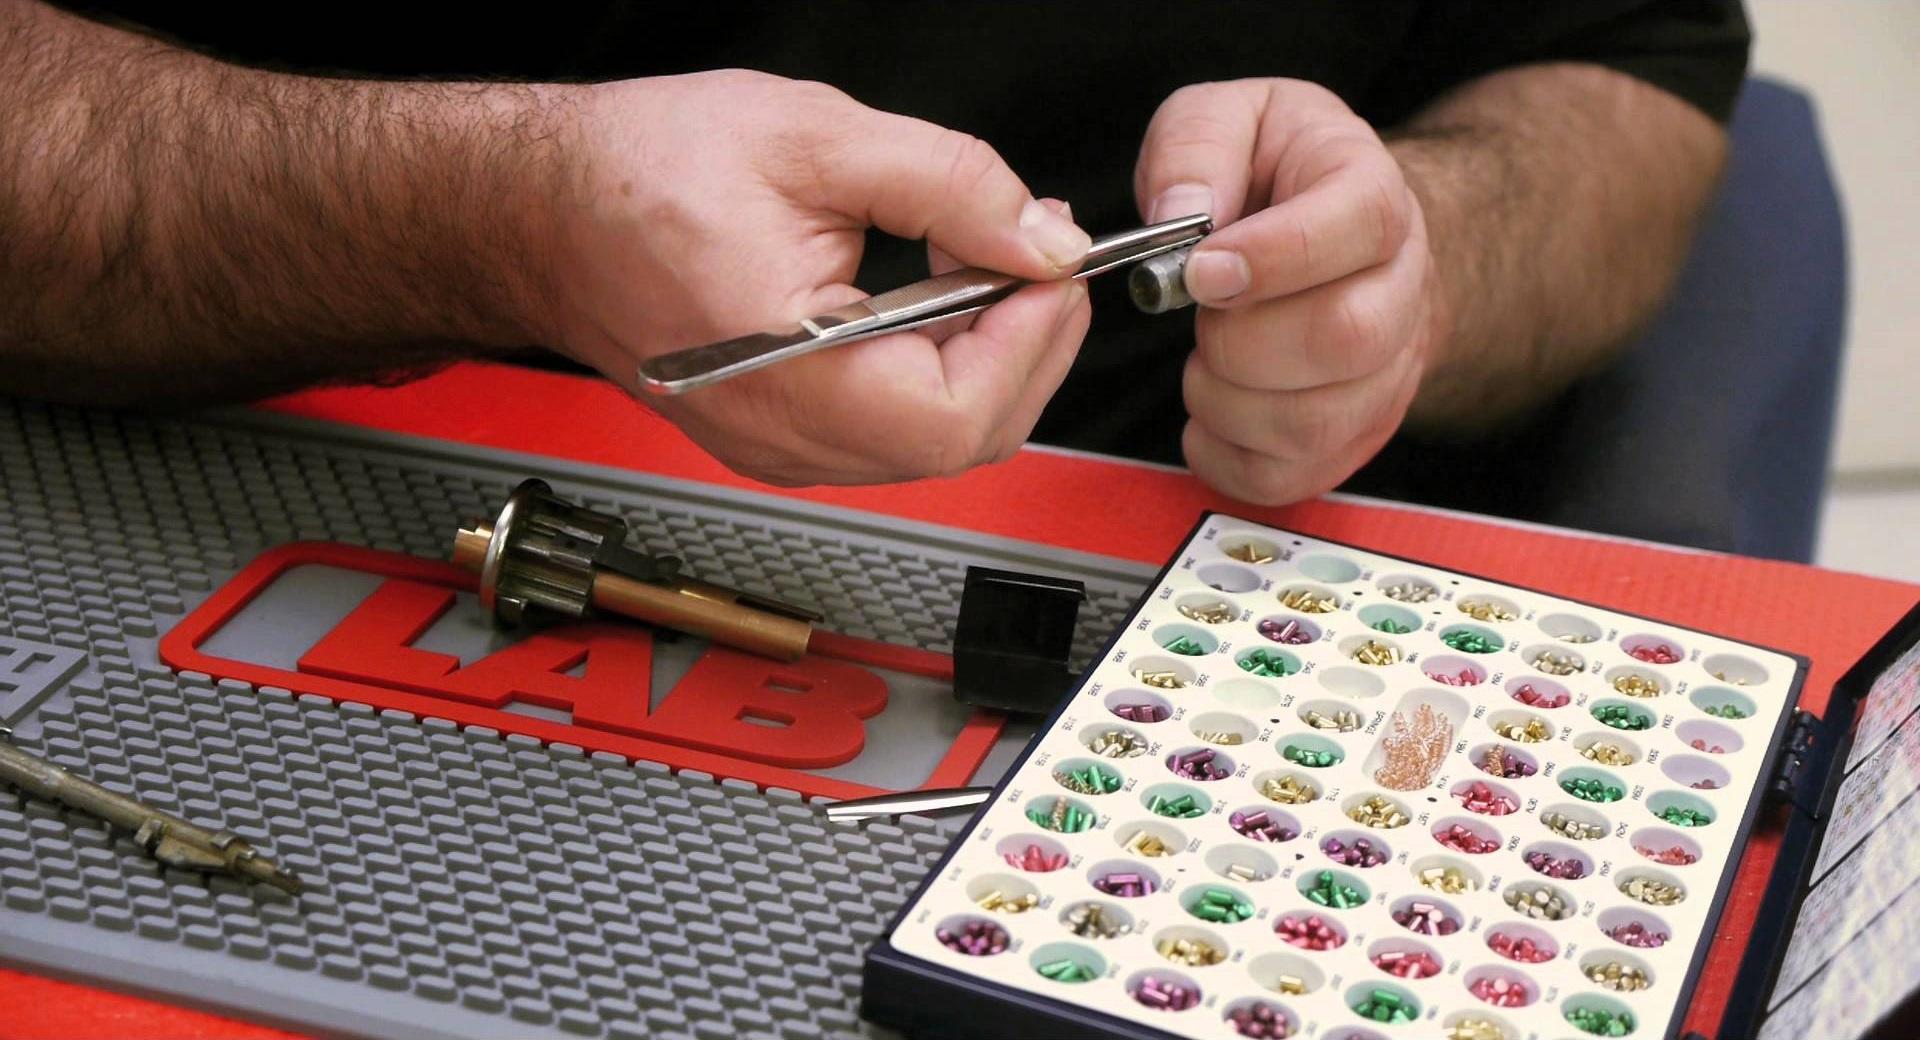 rekey locks service in chandler az get your locks re keyed today rekey chandler